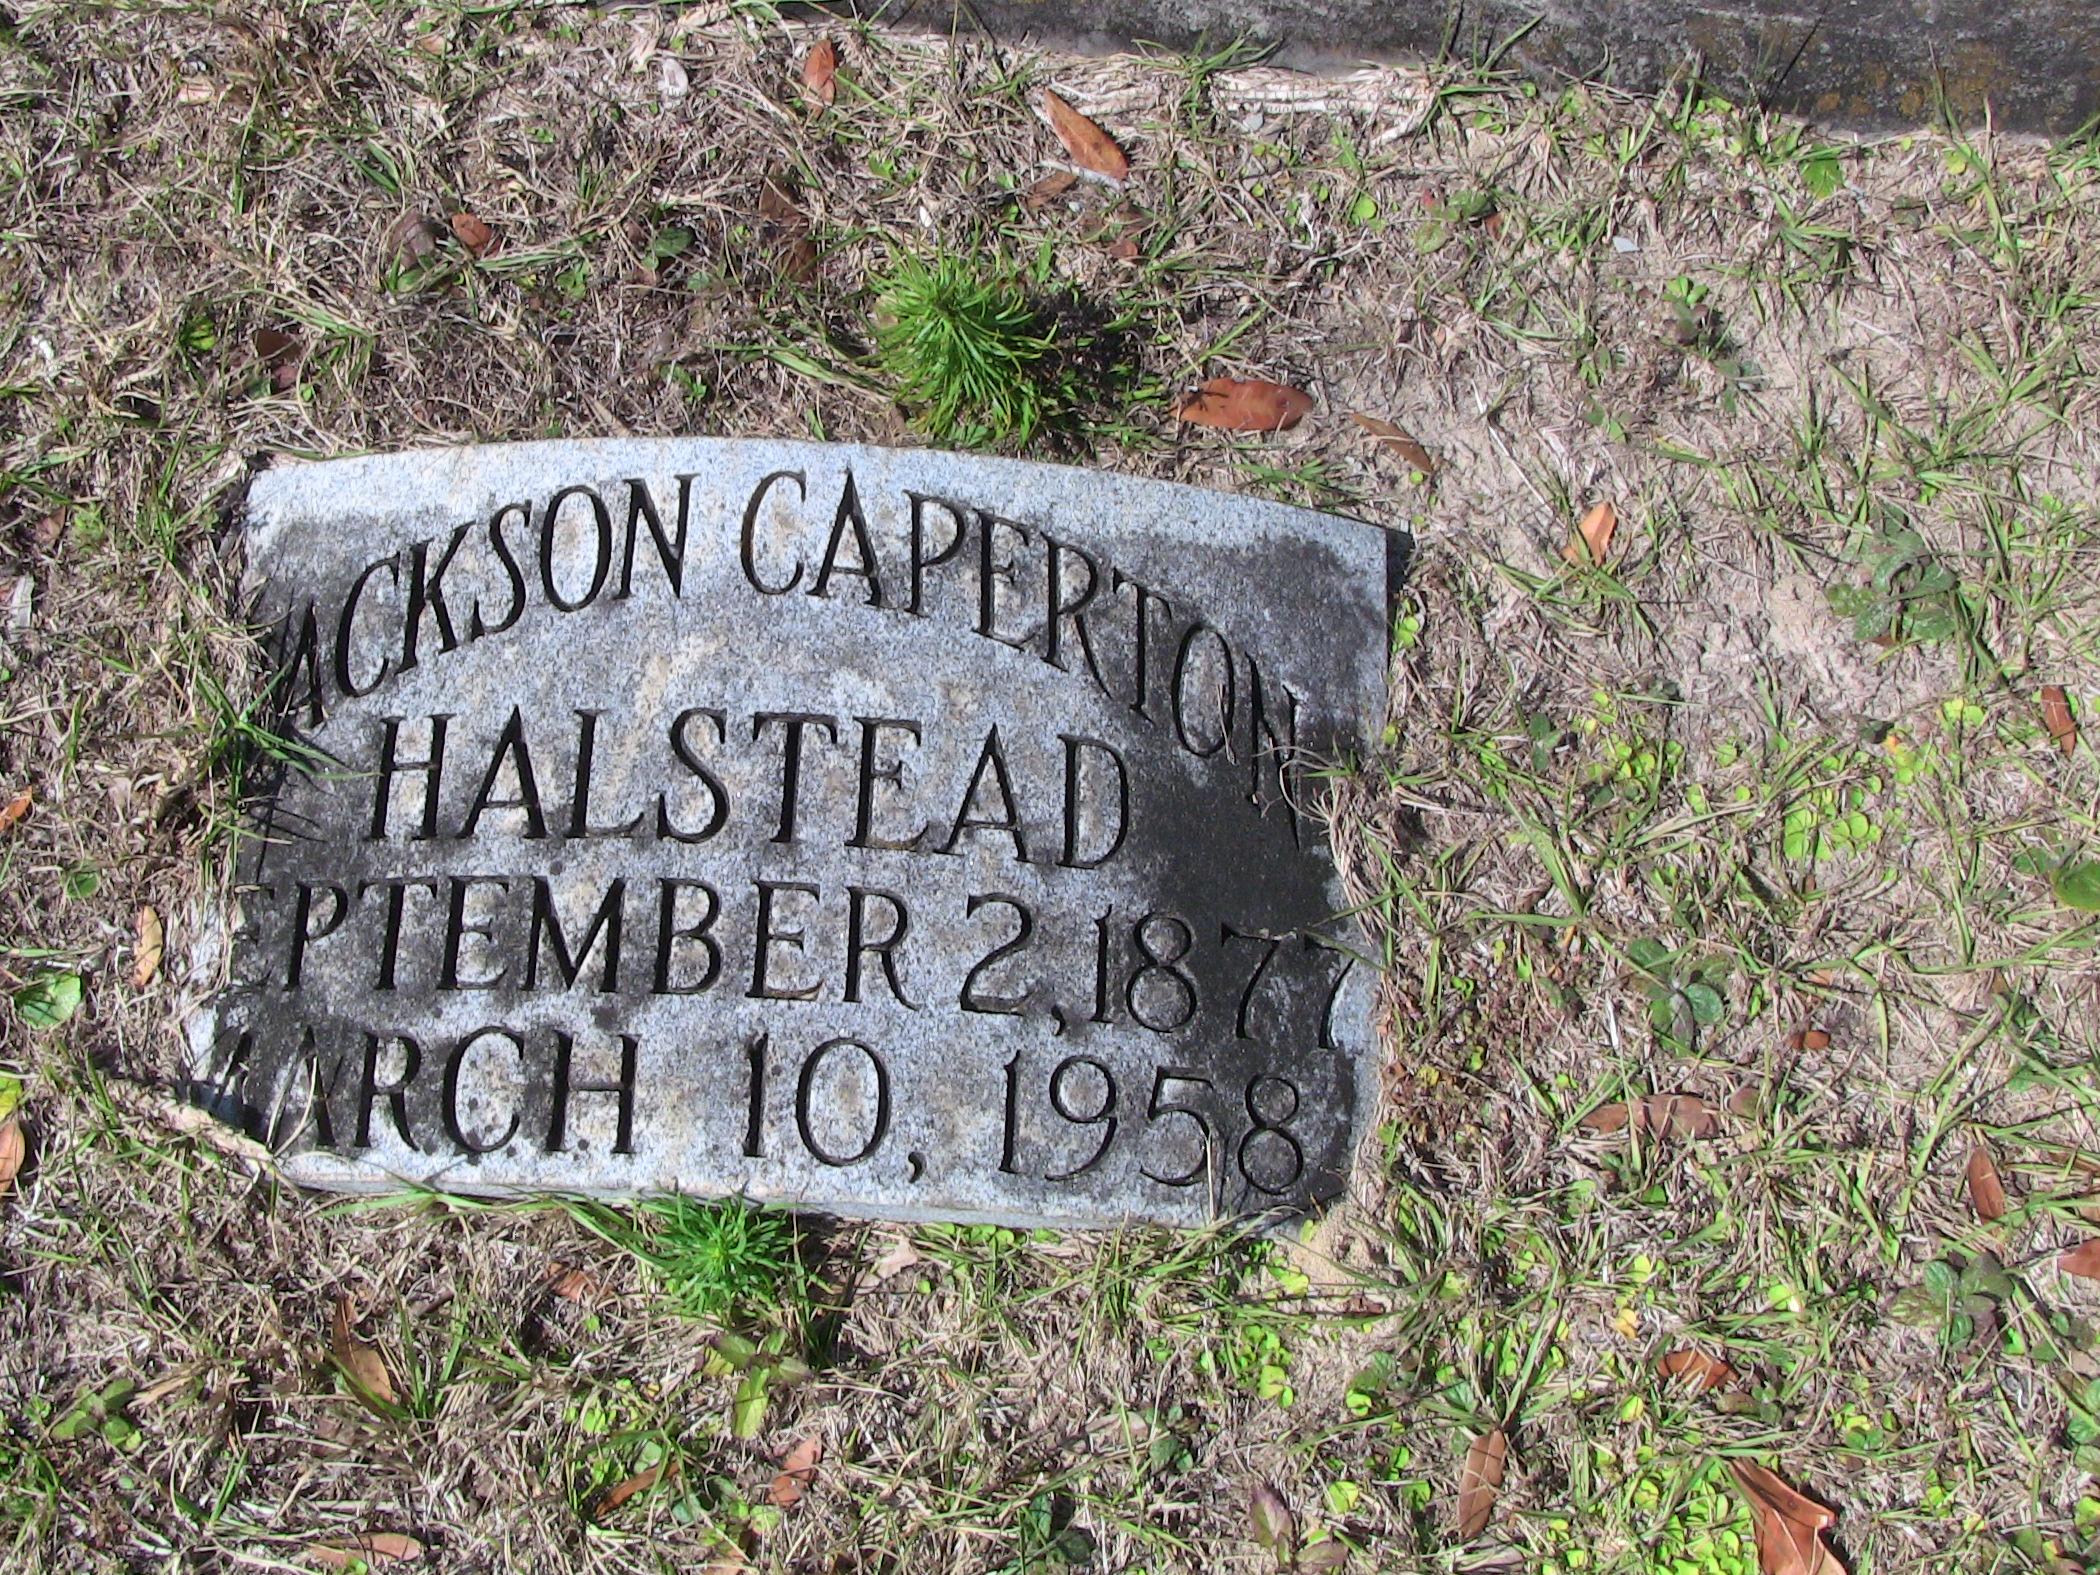 Jackson Carpenton Halstead